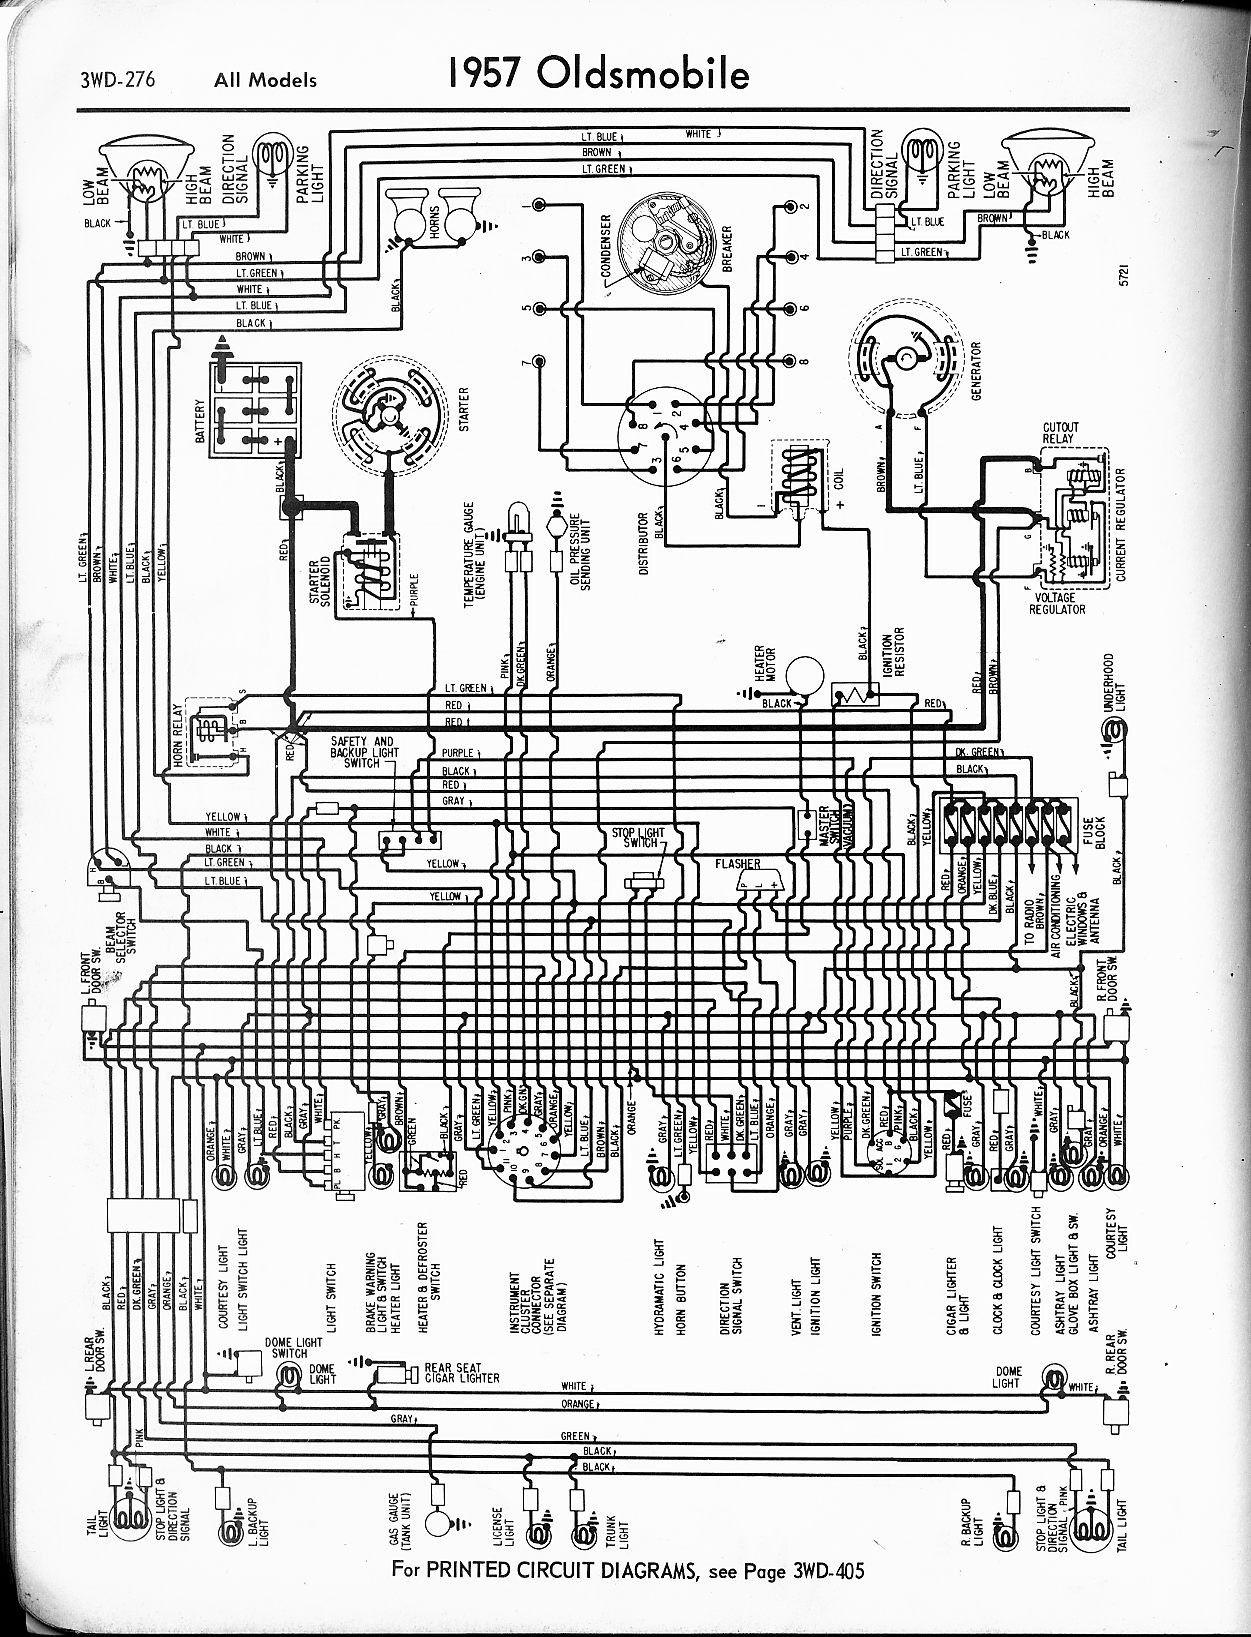 2001 Mercury Sable Engine Diagram 1984 Cutlass Wiring Diagram Wiring Info Of 2001 Mercury Sable Engine Diagram In 2020 Mercury Sable Valve Cover English Love Quotes